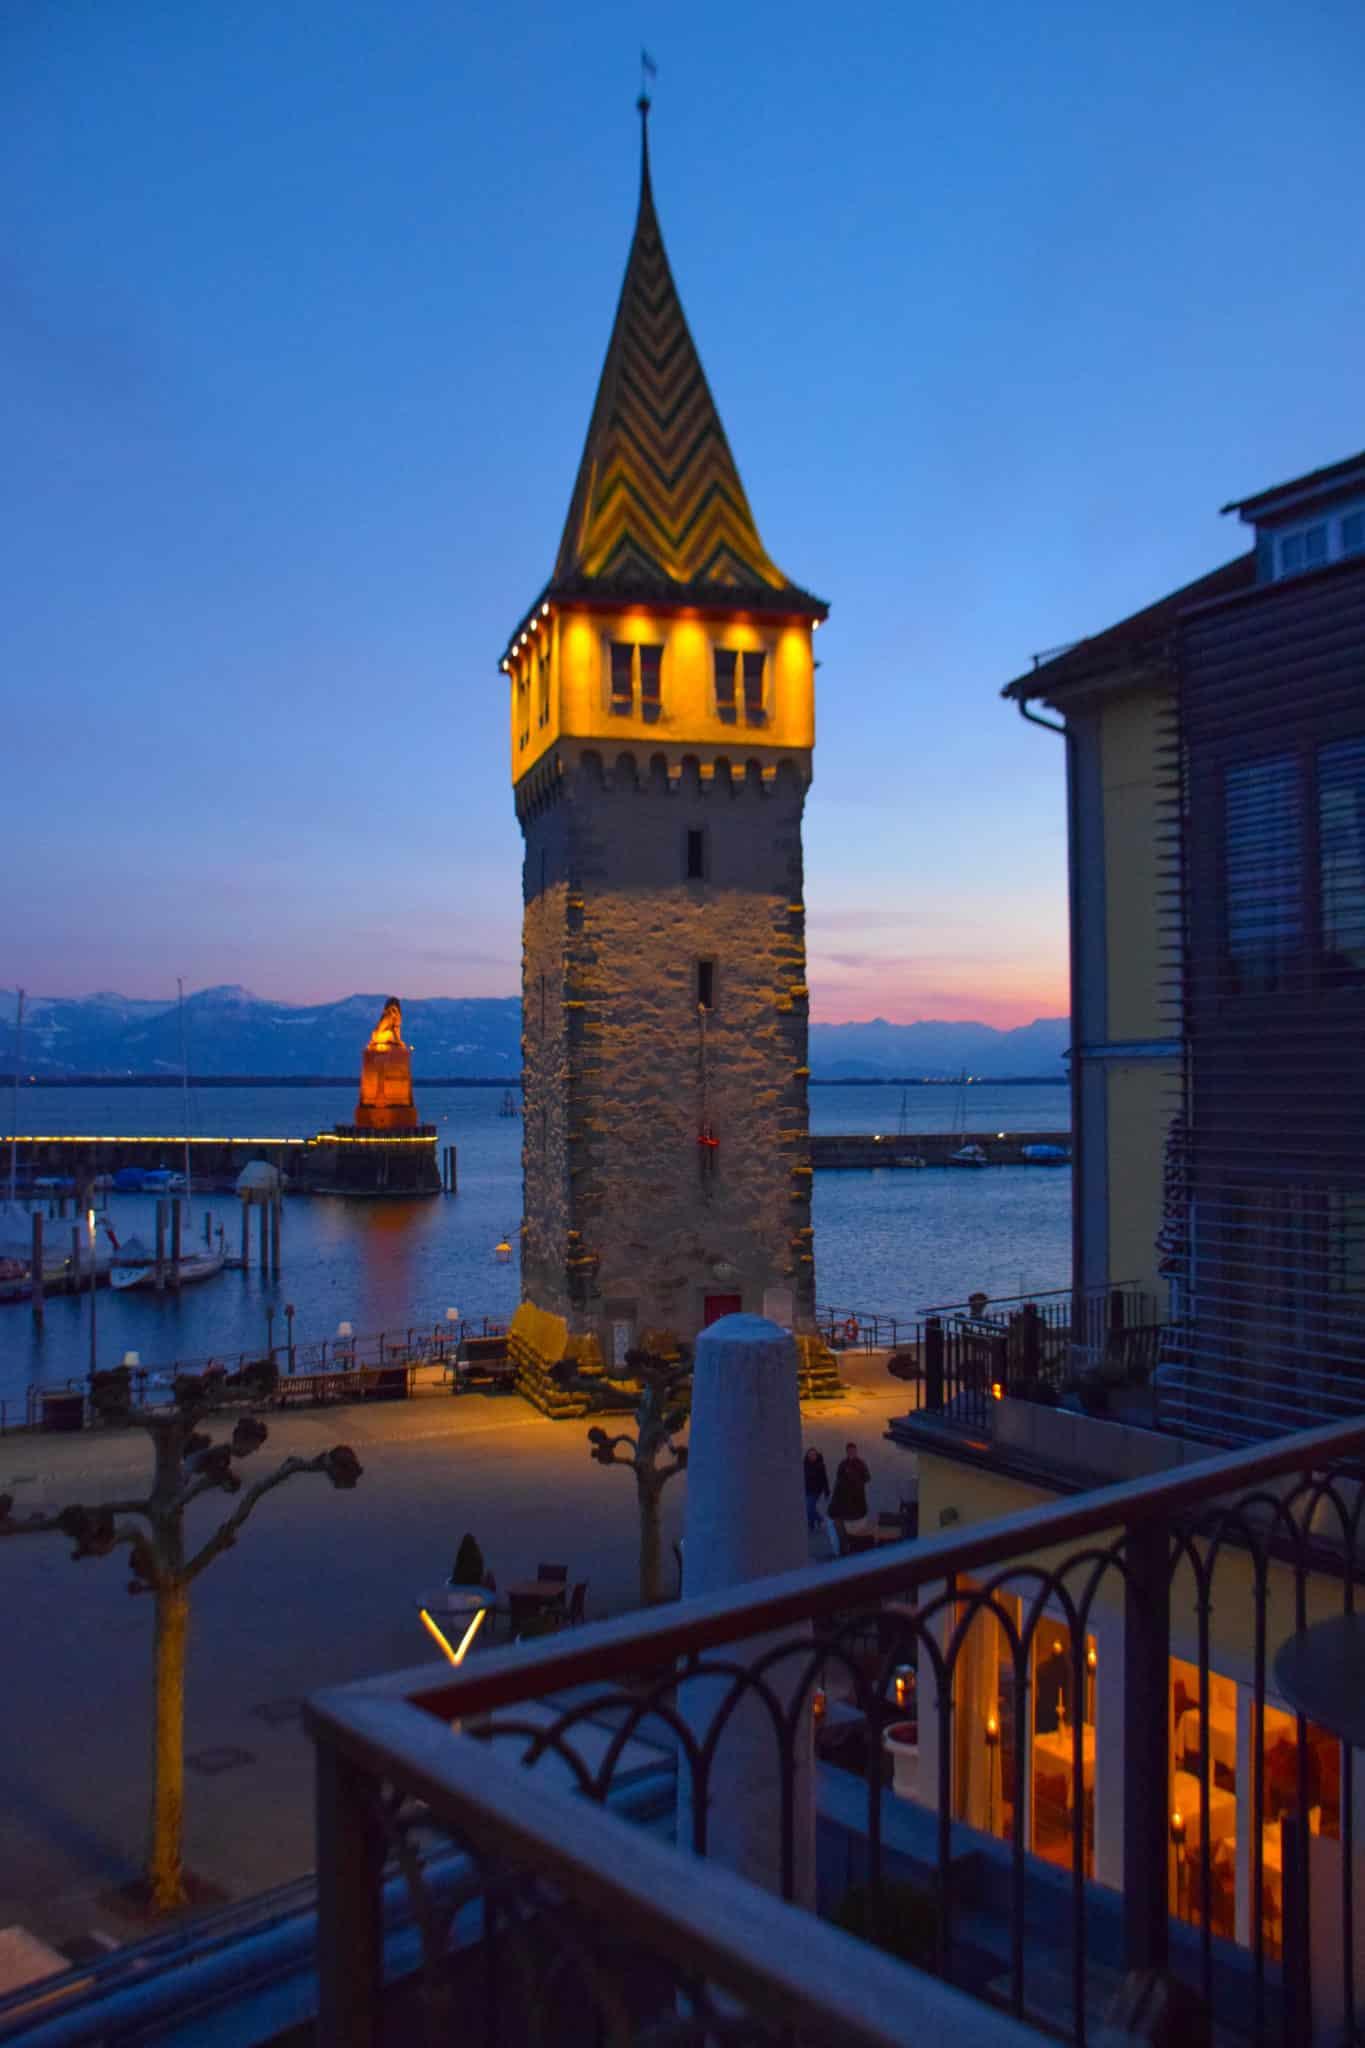 Mangturm Lighthouse Lindau Island Germany